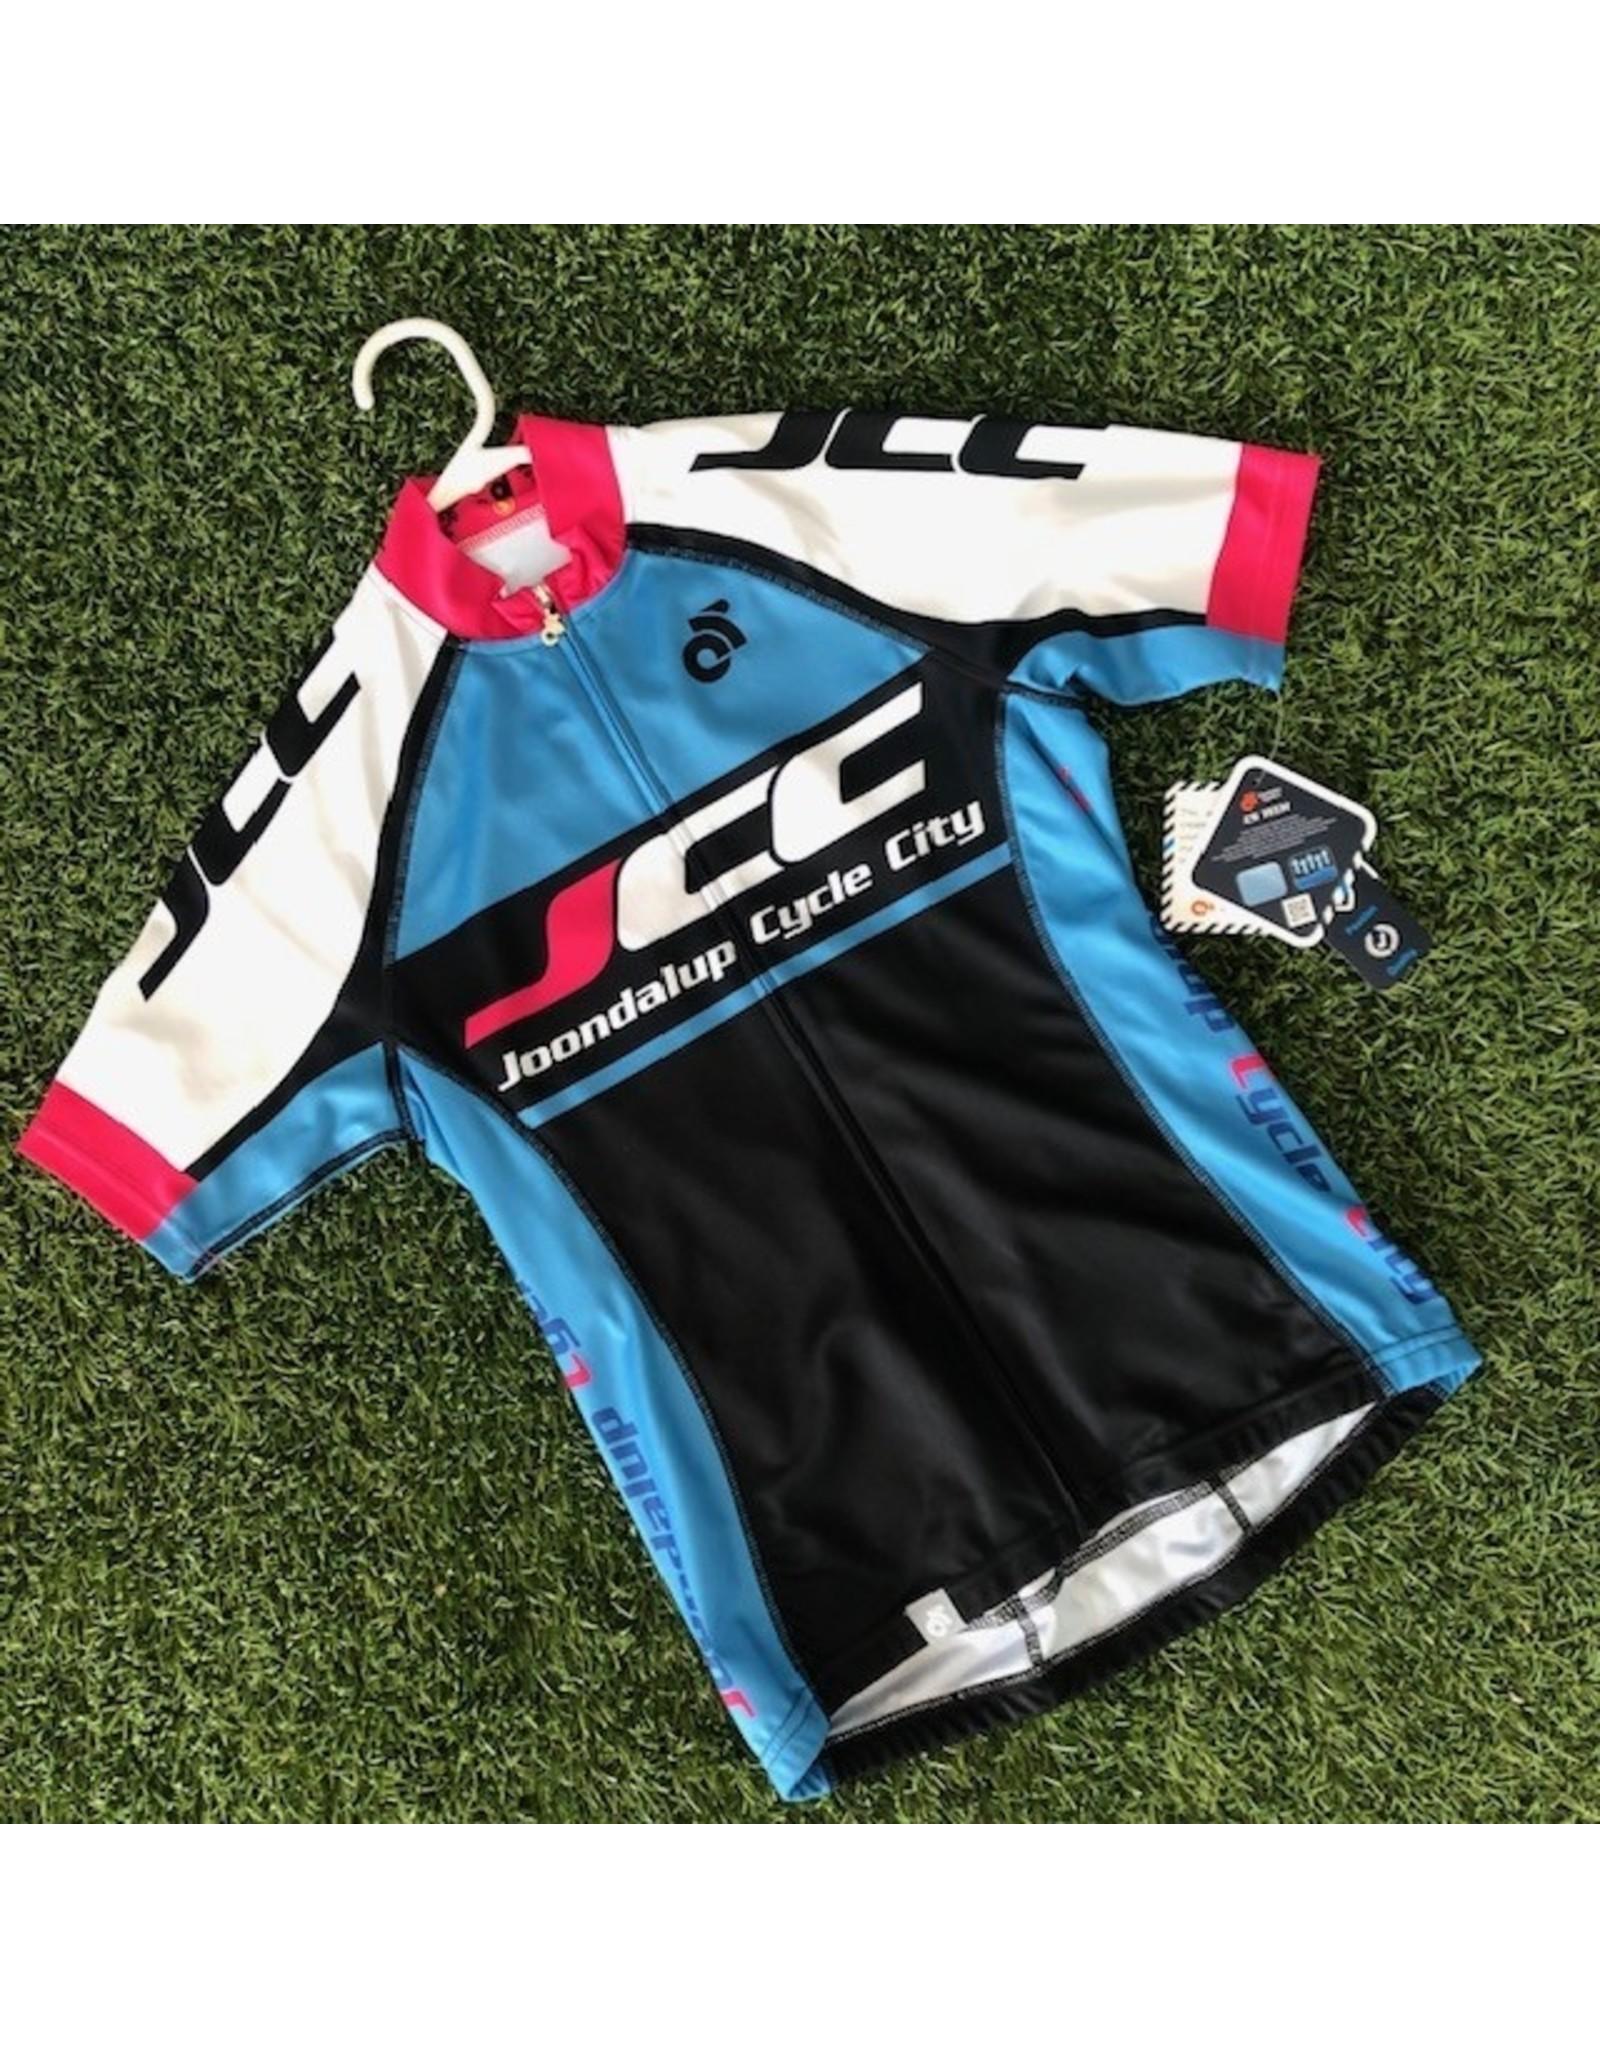 JCC Forte Bella 2017 Ladies Cycling Jersey